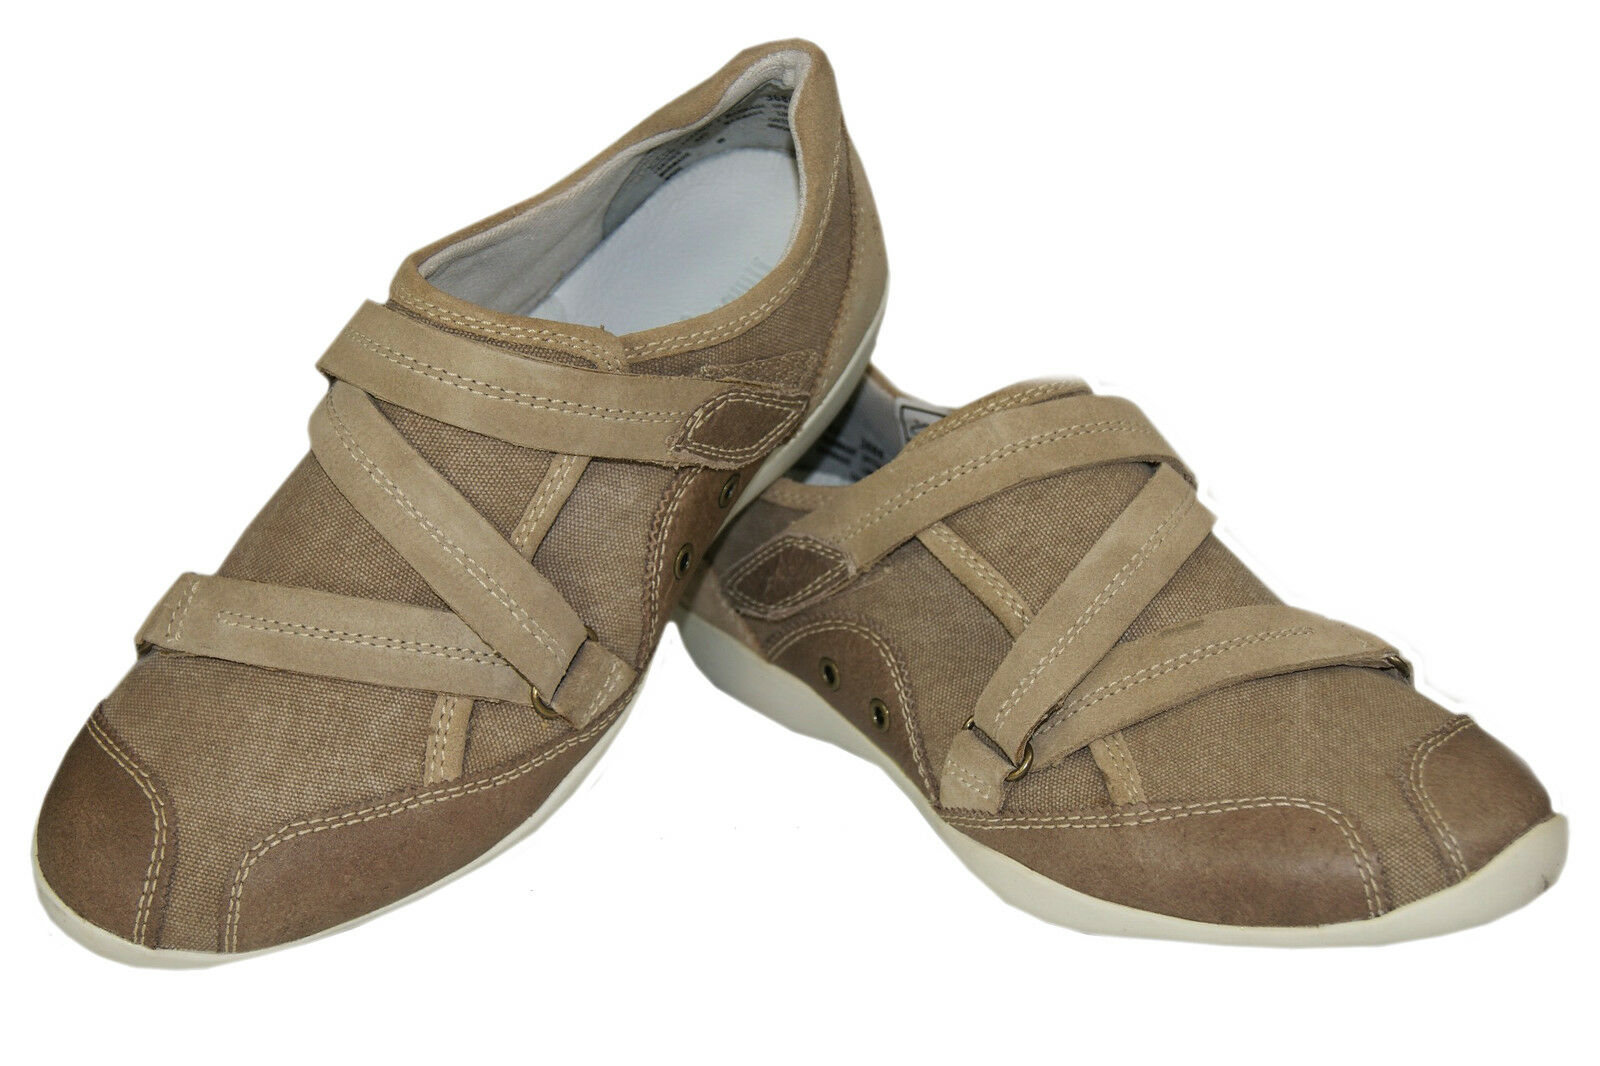 Timberland Baskets Odele Chaussures Basses Chaussures Femmes Mocassins 98303